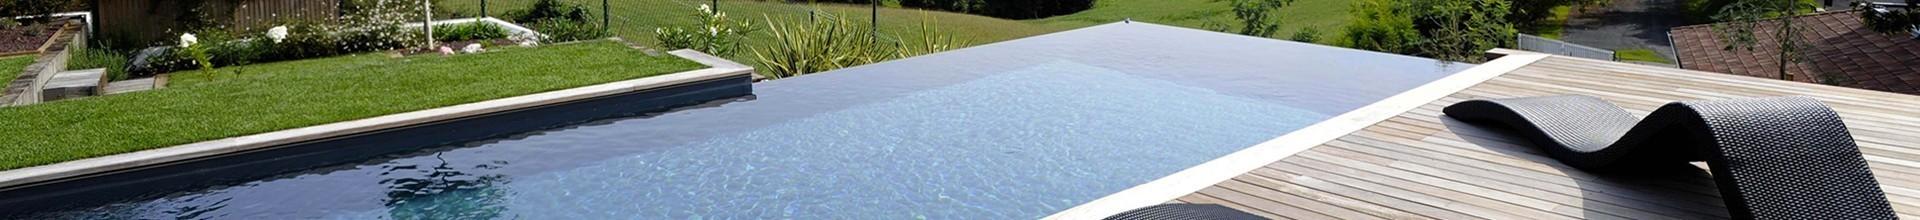 Direct usine, piscine coque prix Val-d'Oise